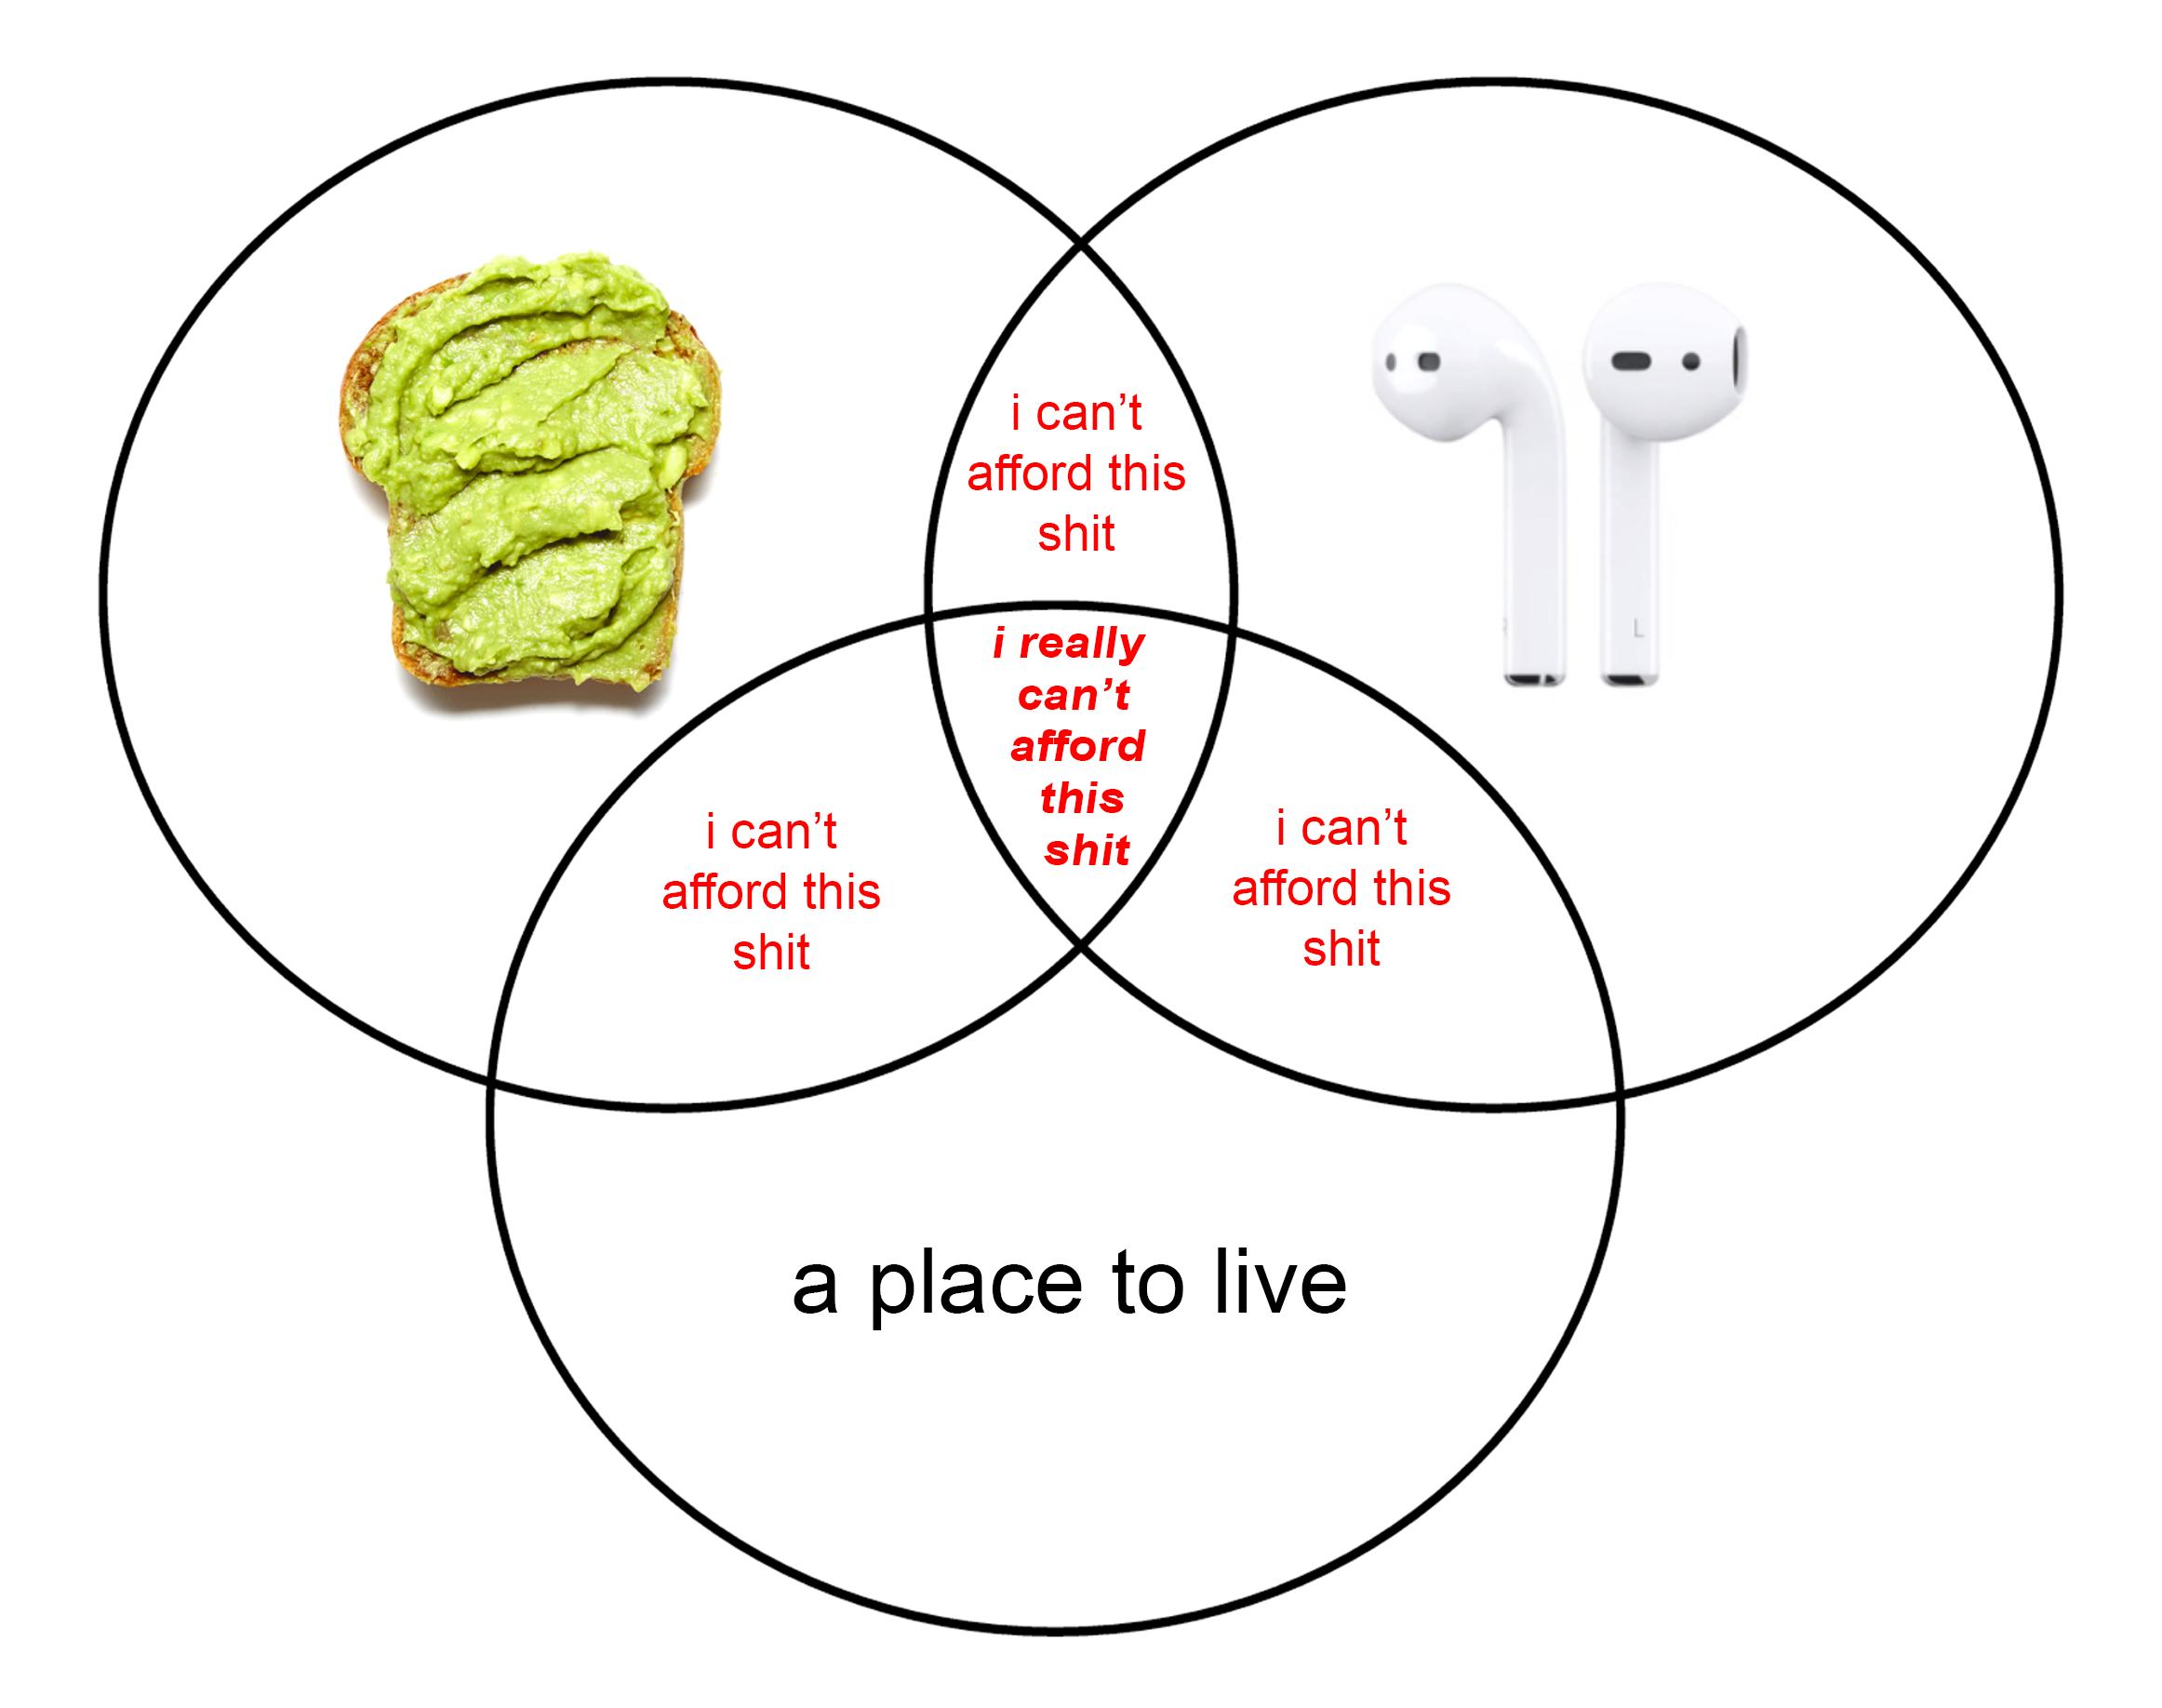 Pictured: Jason's problem-solving diagram.